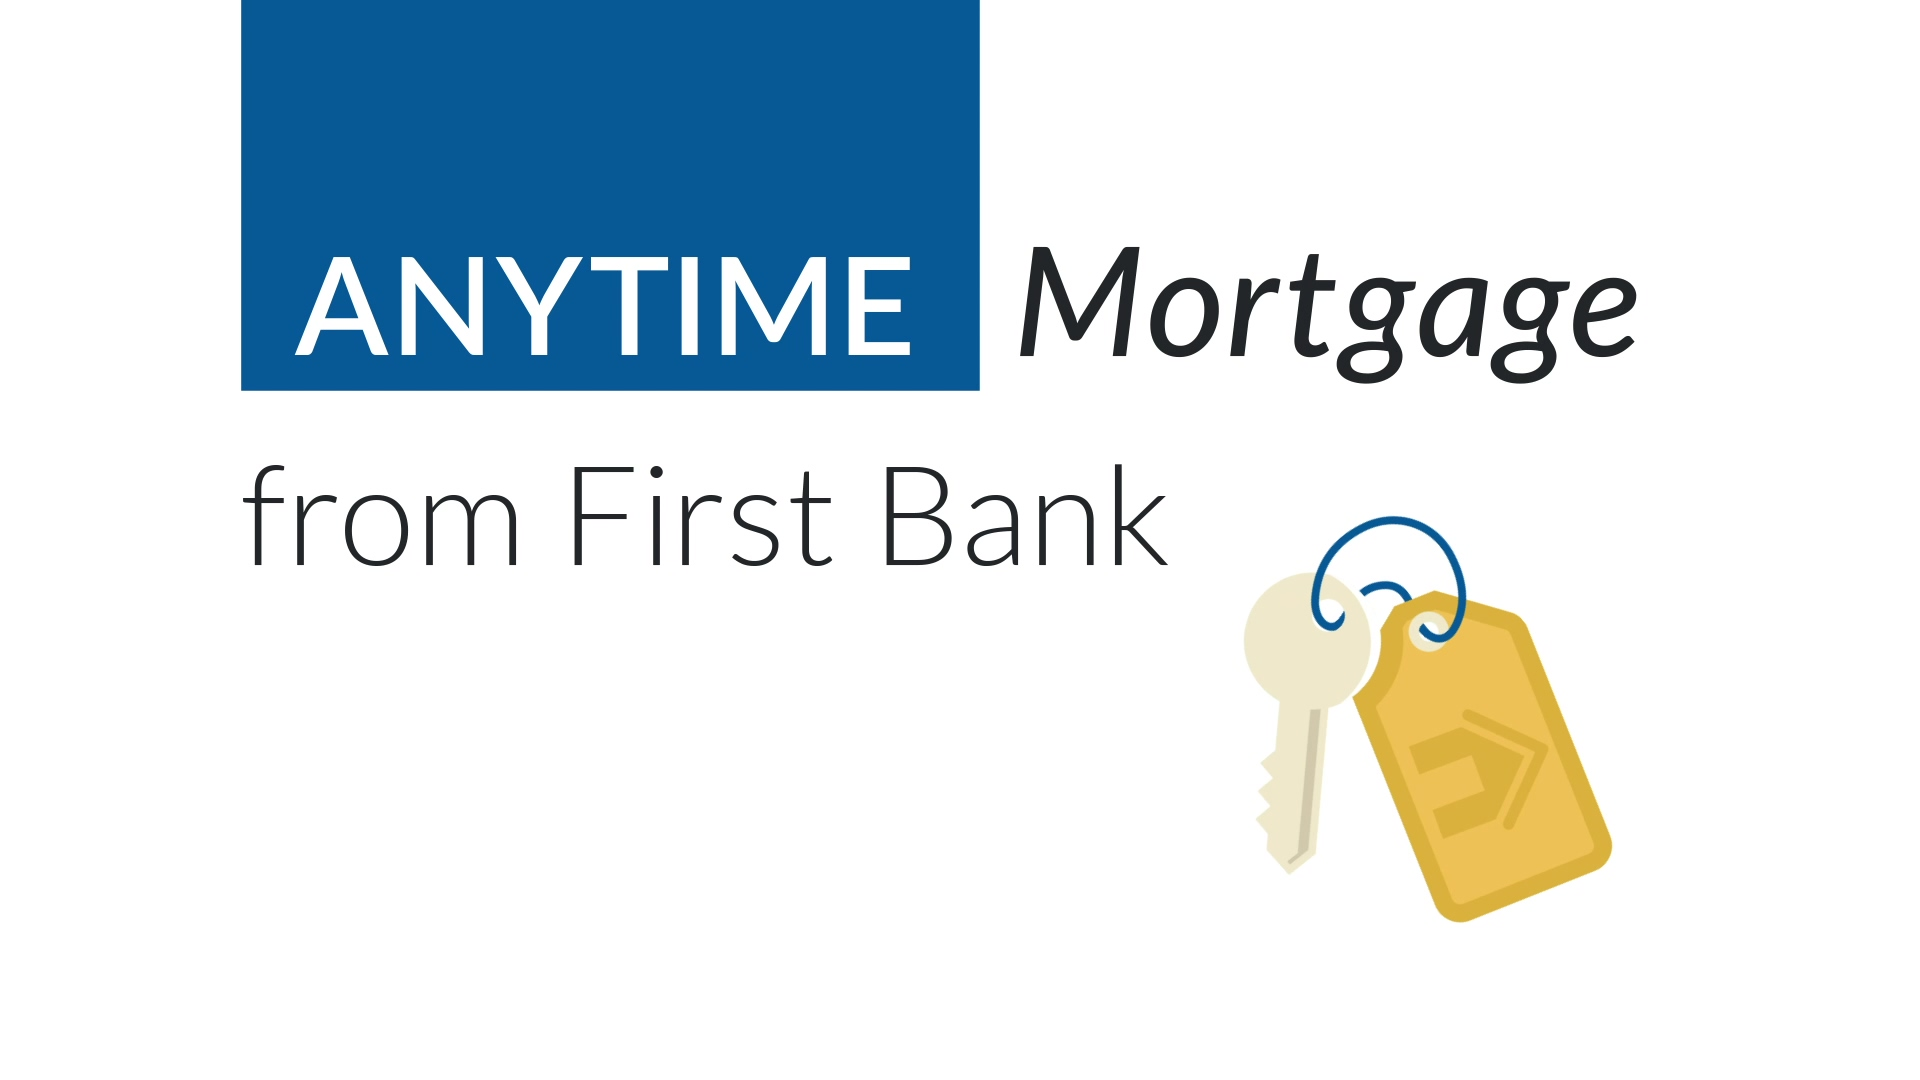 First Bank ANI F21008-A[1]